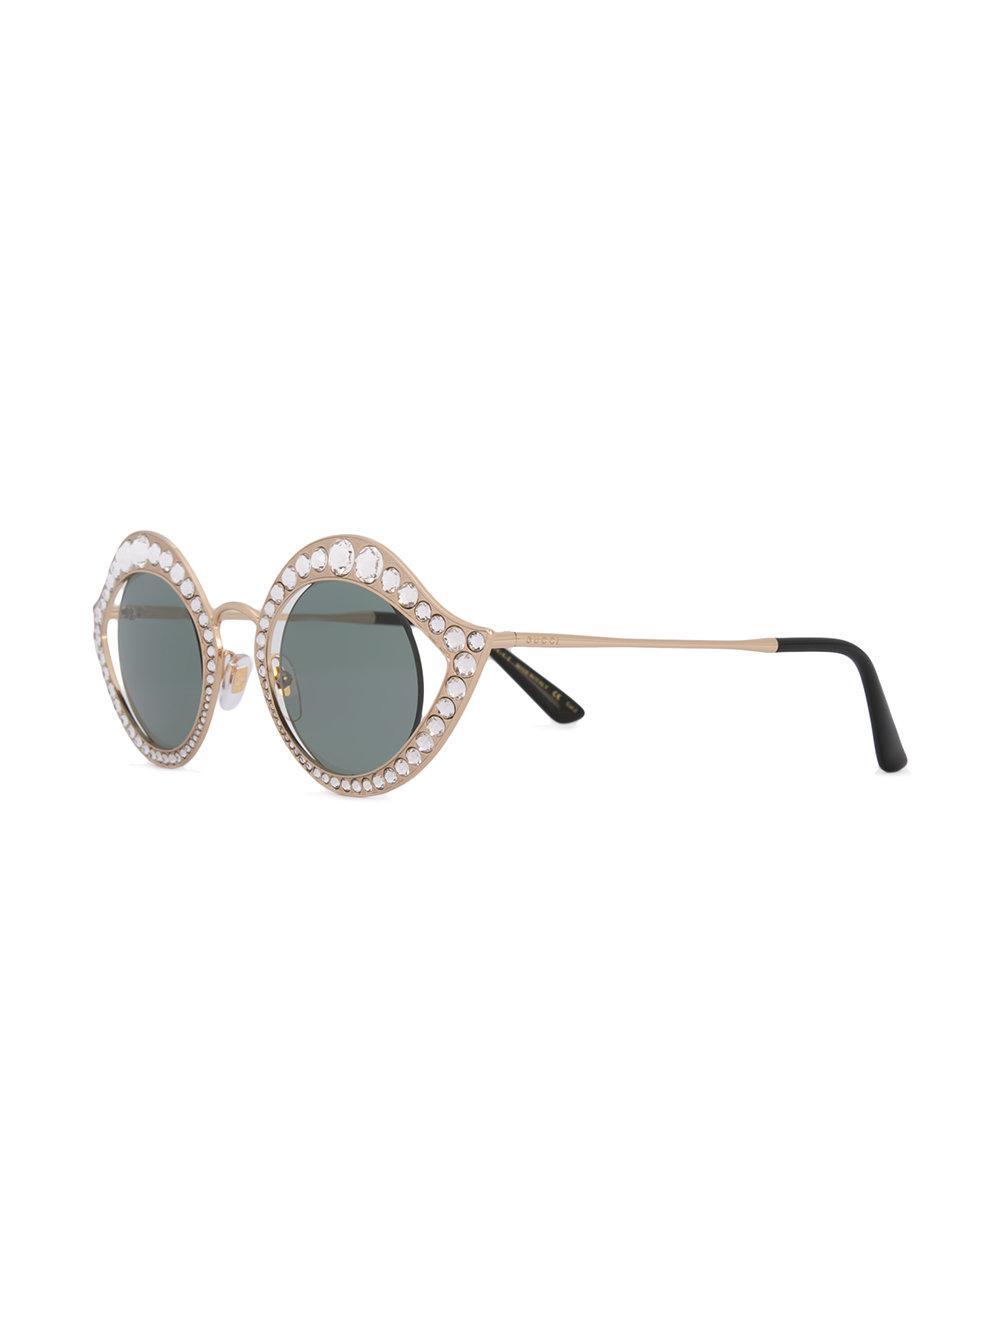 a891ba95ac2 PRADA Studded Ornate Cat Eye Sunglasses SPR 31Q Black 172166. Gucci Studded  Cat Eye Sunglasses in Metallic